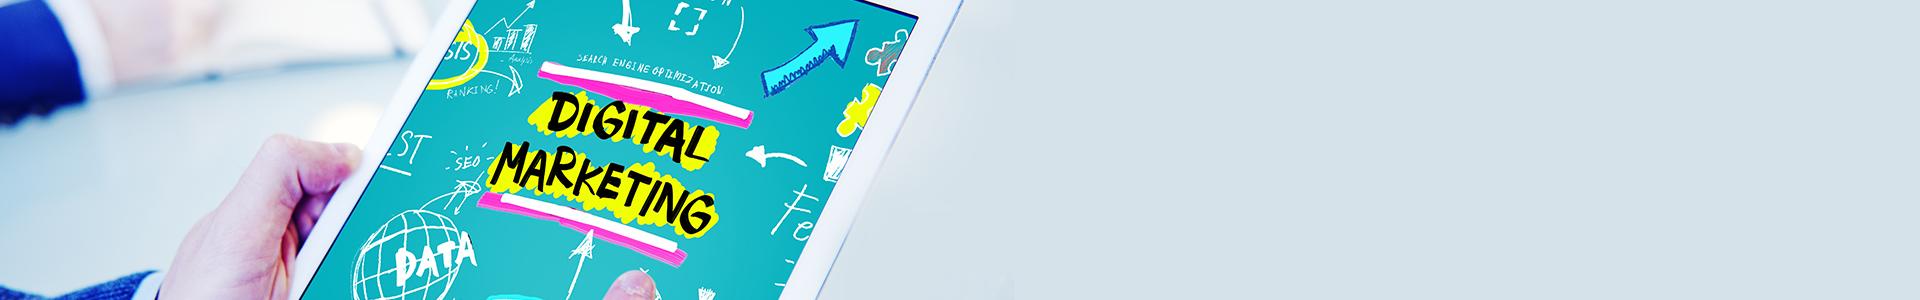 Digital-Marketing-Course Blog Image